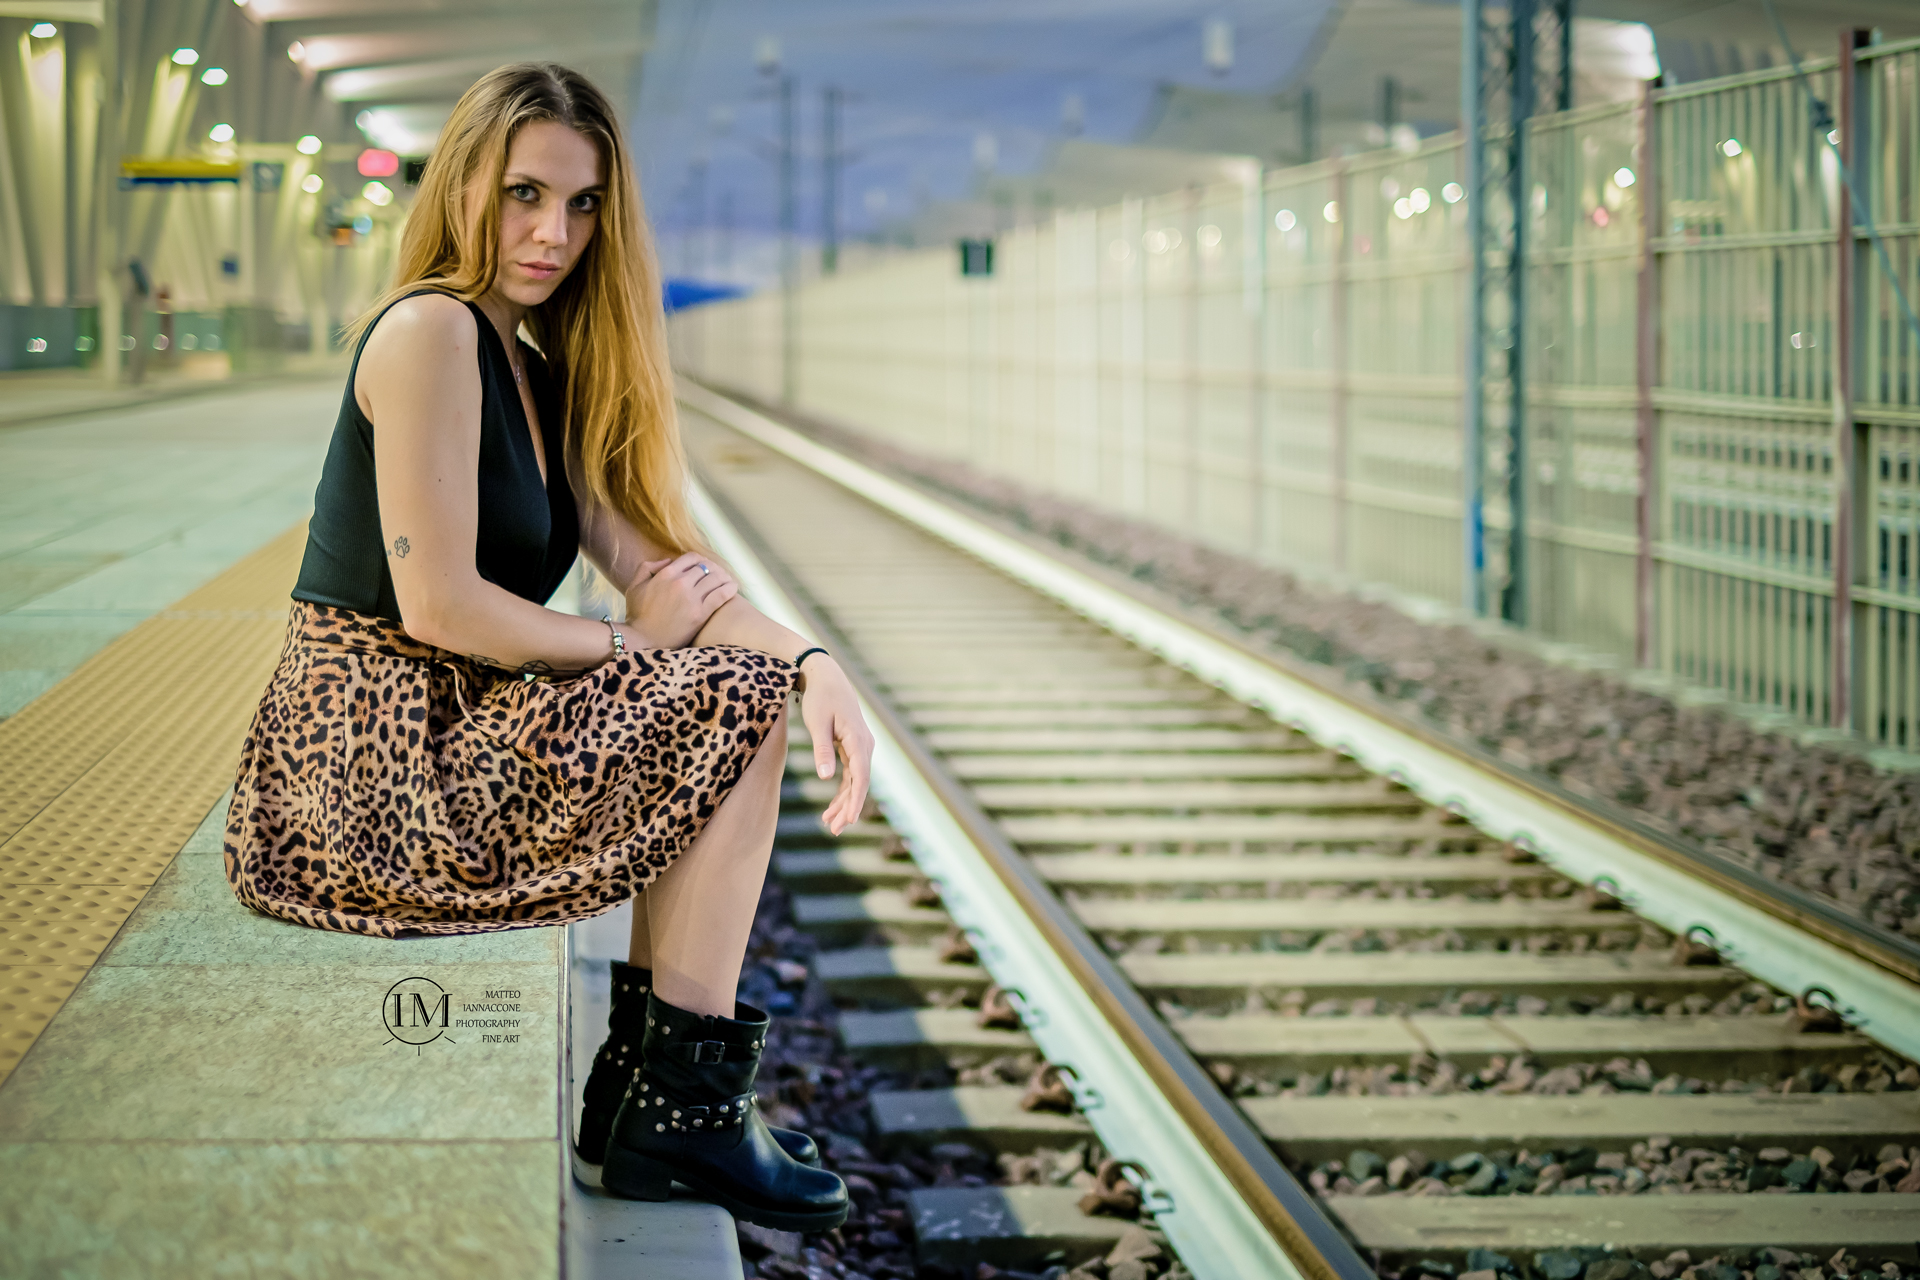 Categorie: Fashion, Glamour, Portrait, Street; Photo: MATTEO IANNACCONE; Model: CHIARA NUNZIATO; Reggio Emilia, RE